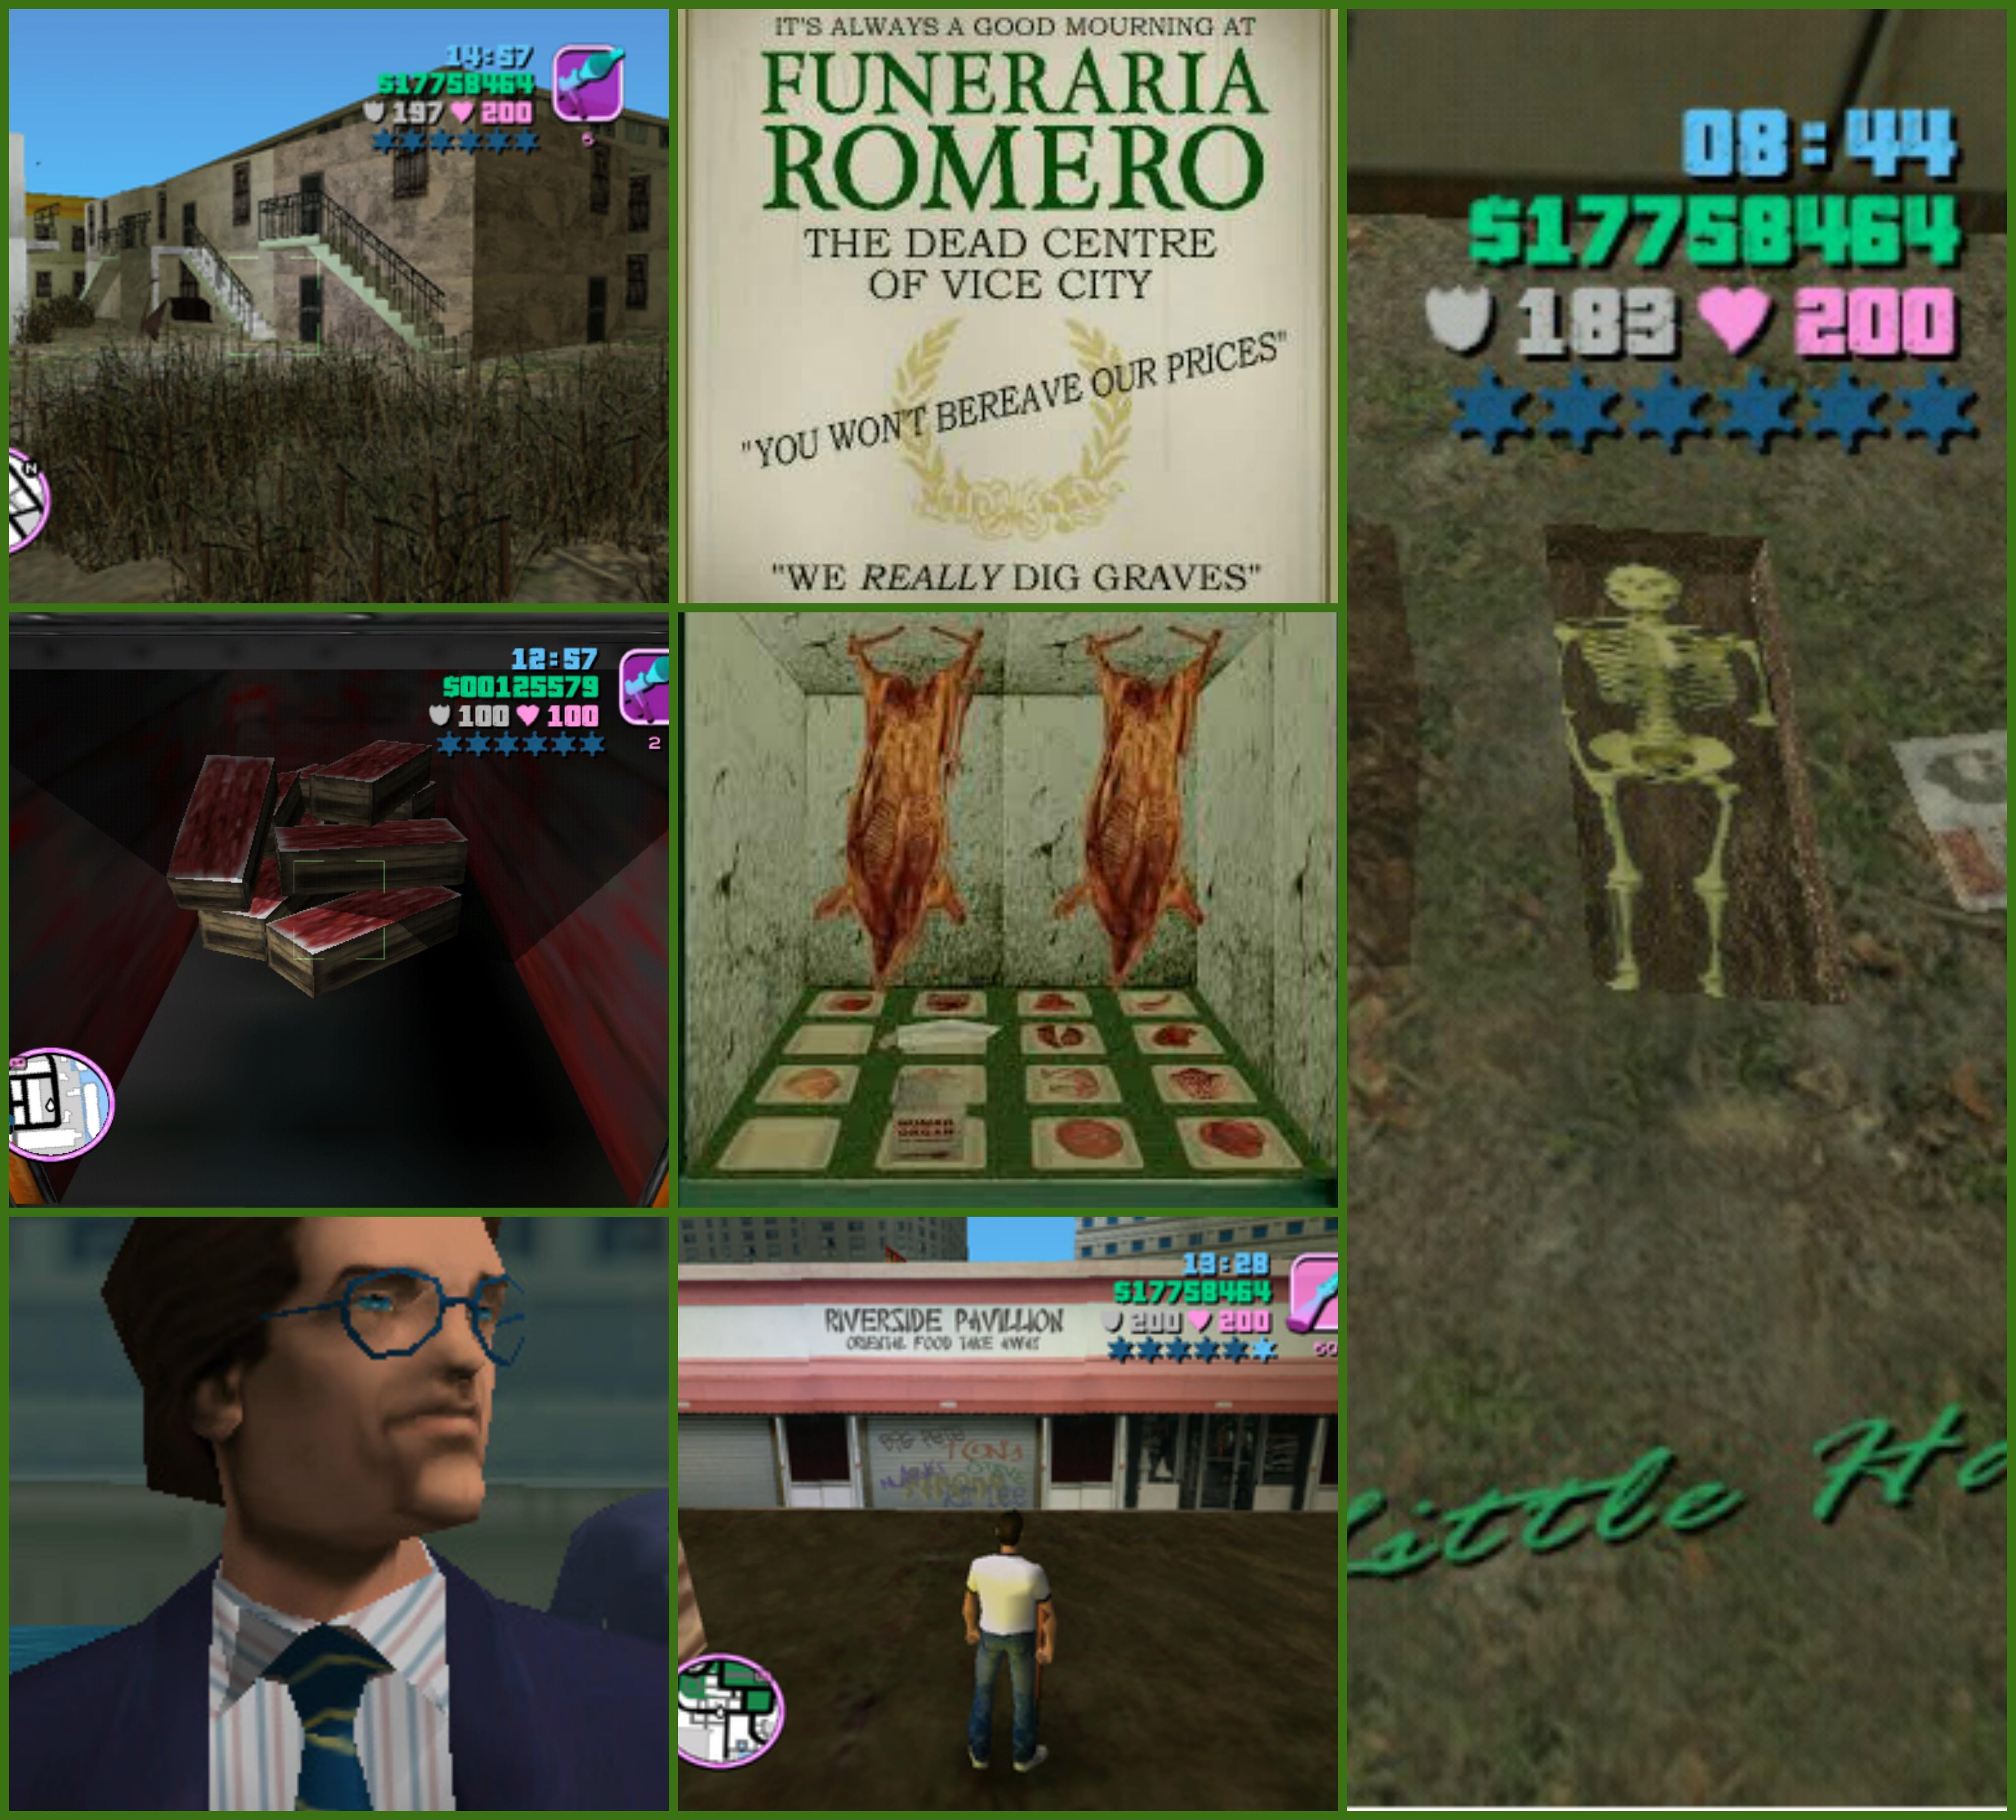 Romero Riddle